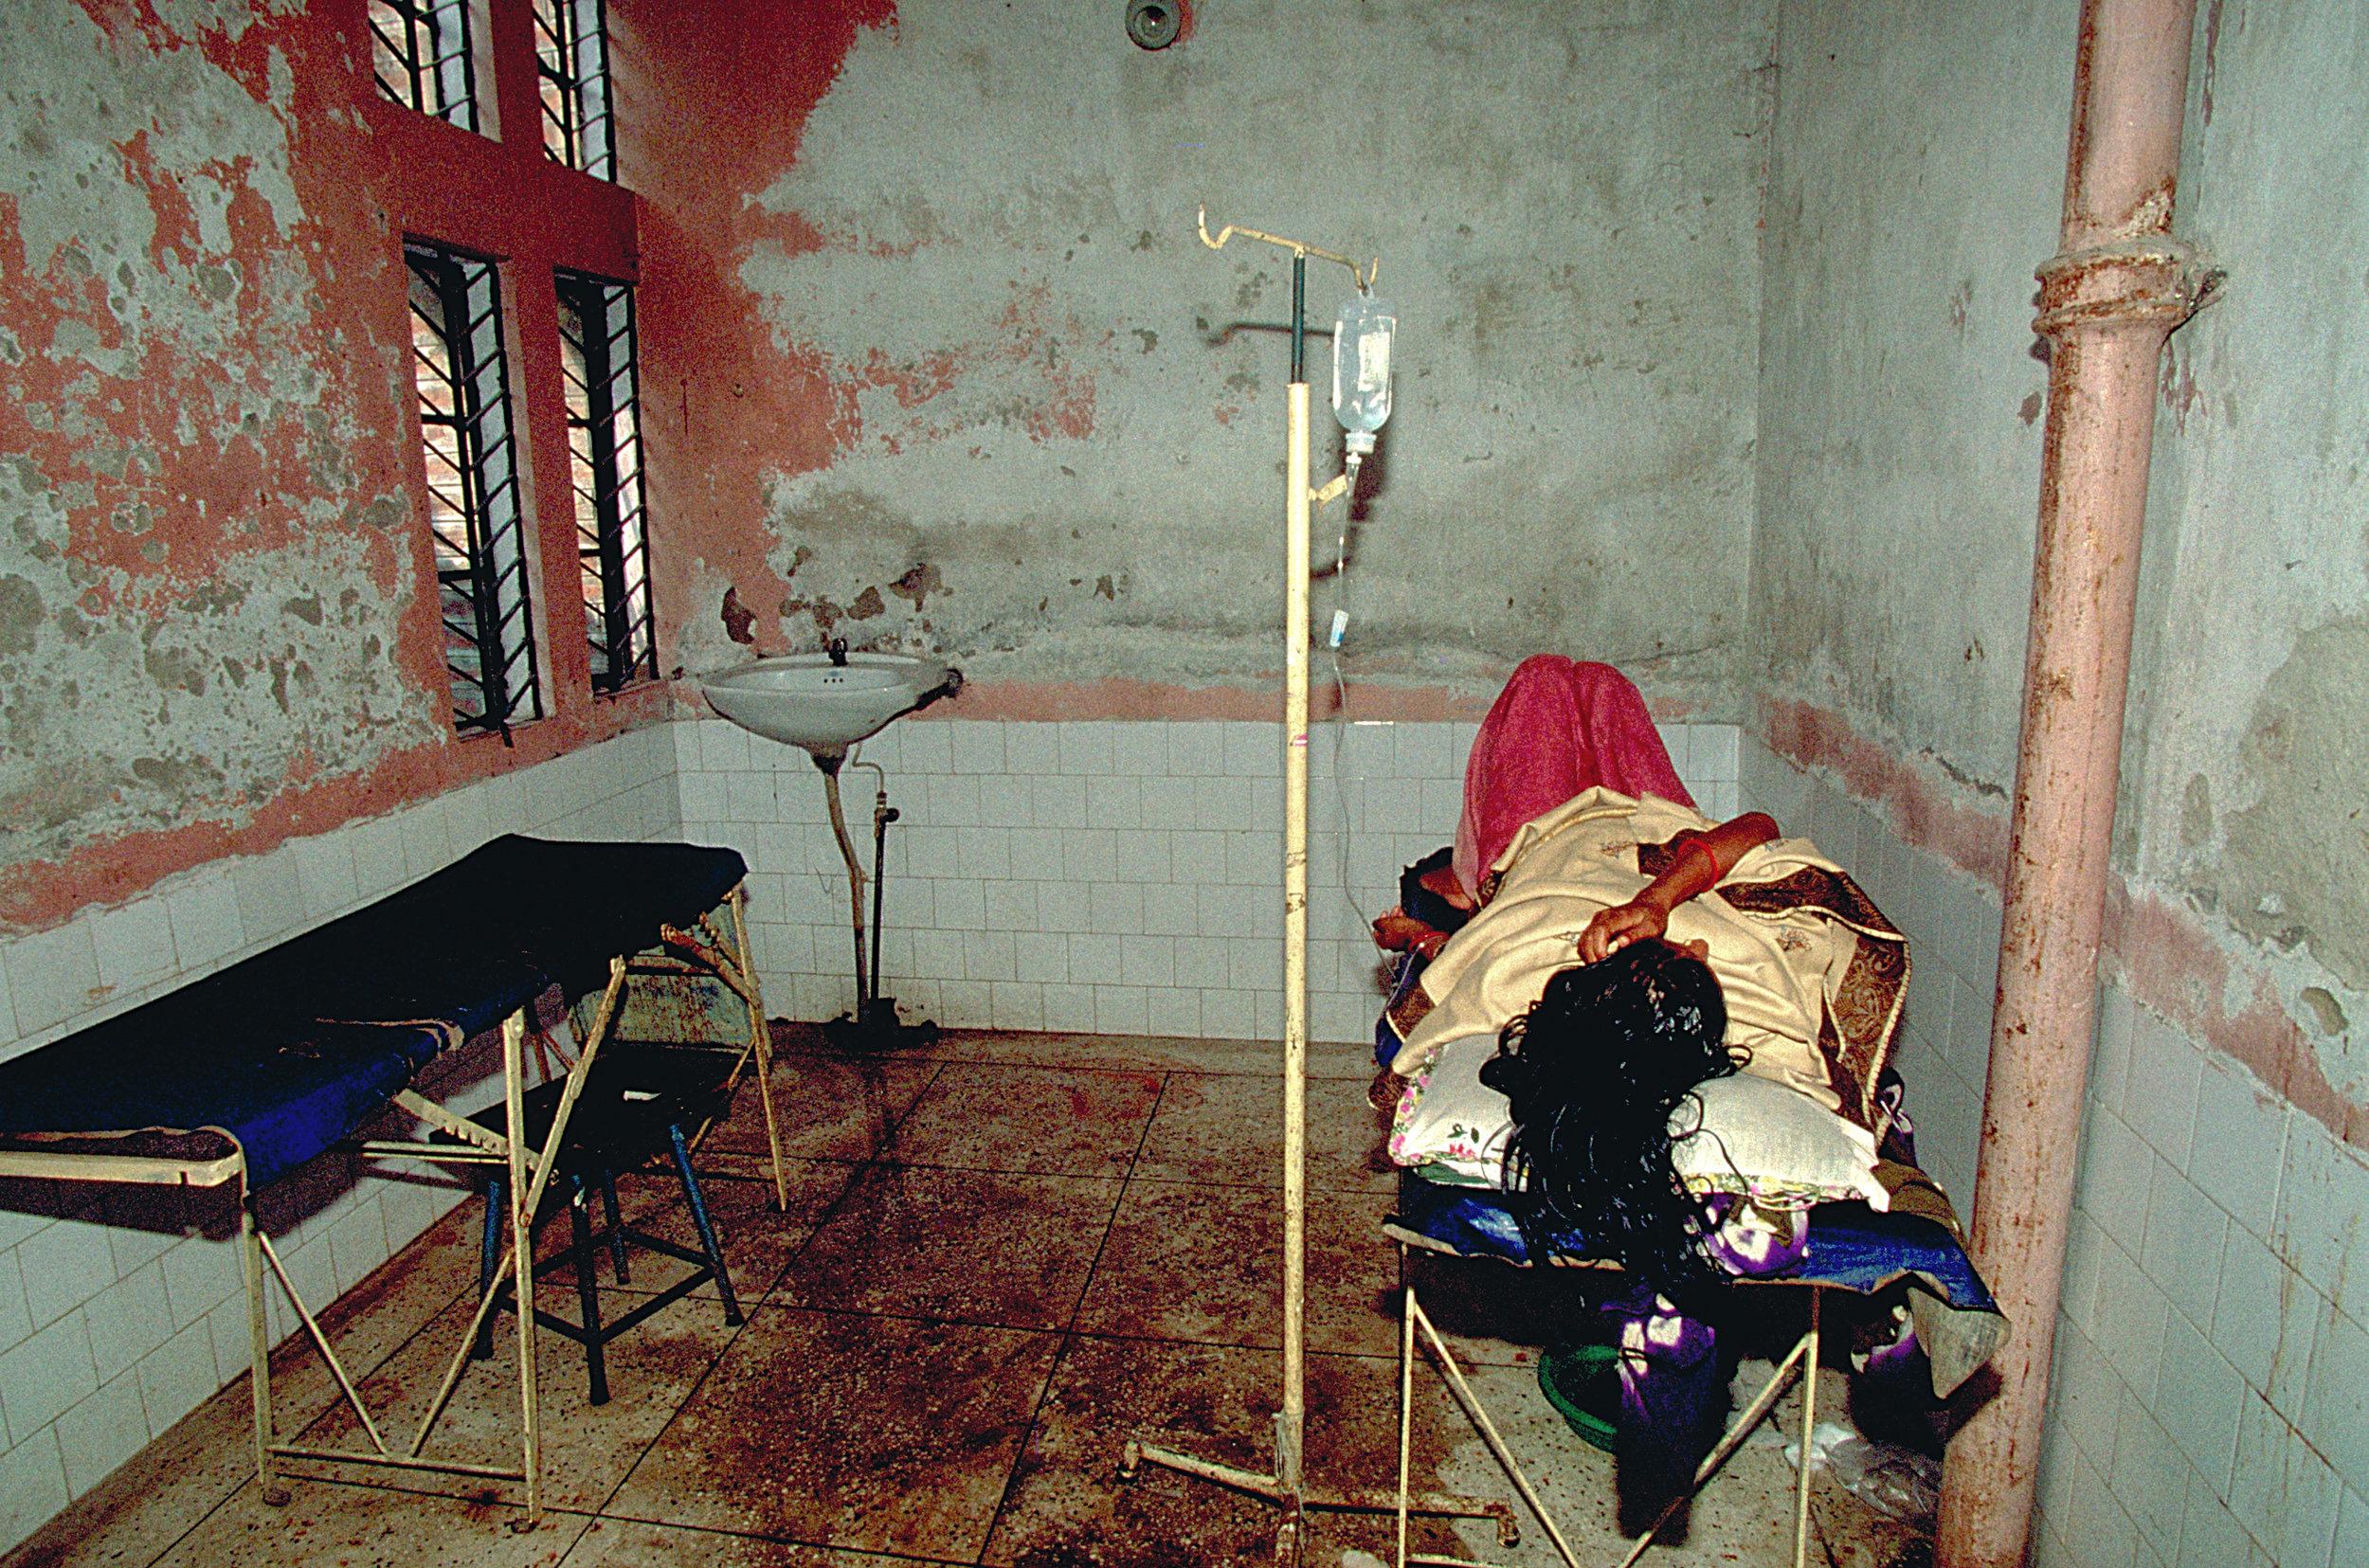 BGD_Feb 2000_158.jpg